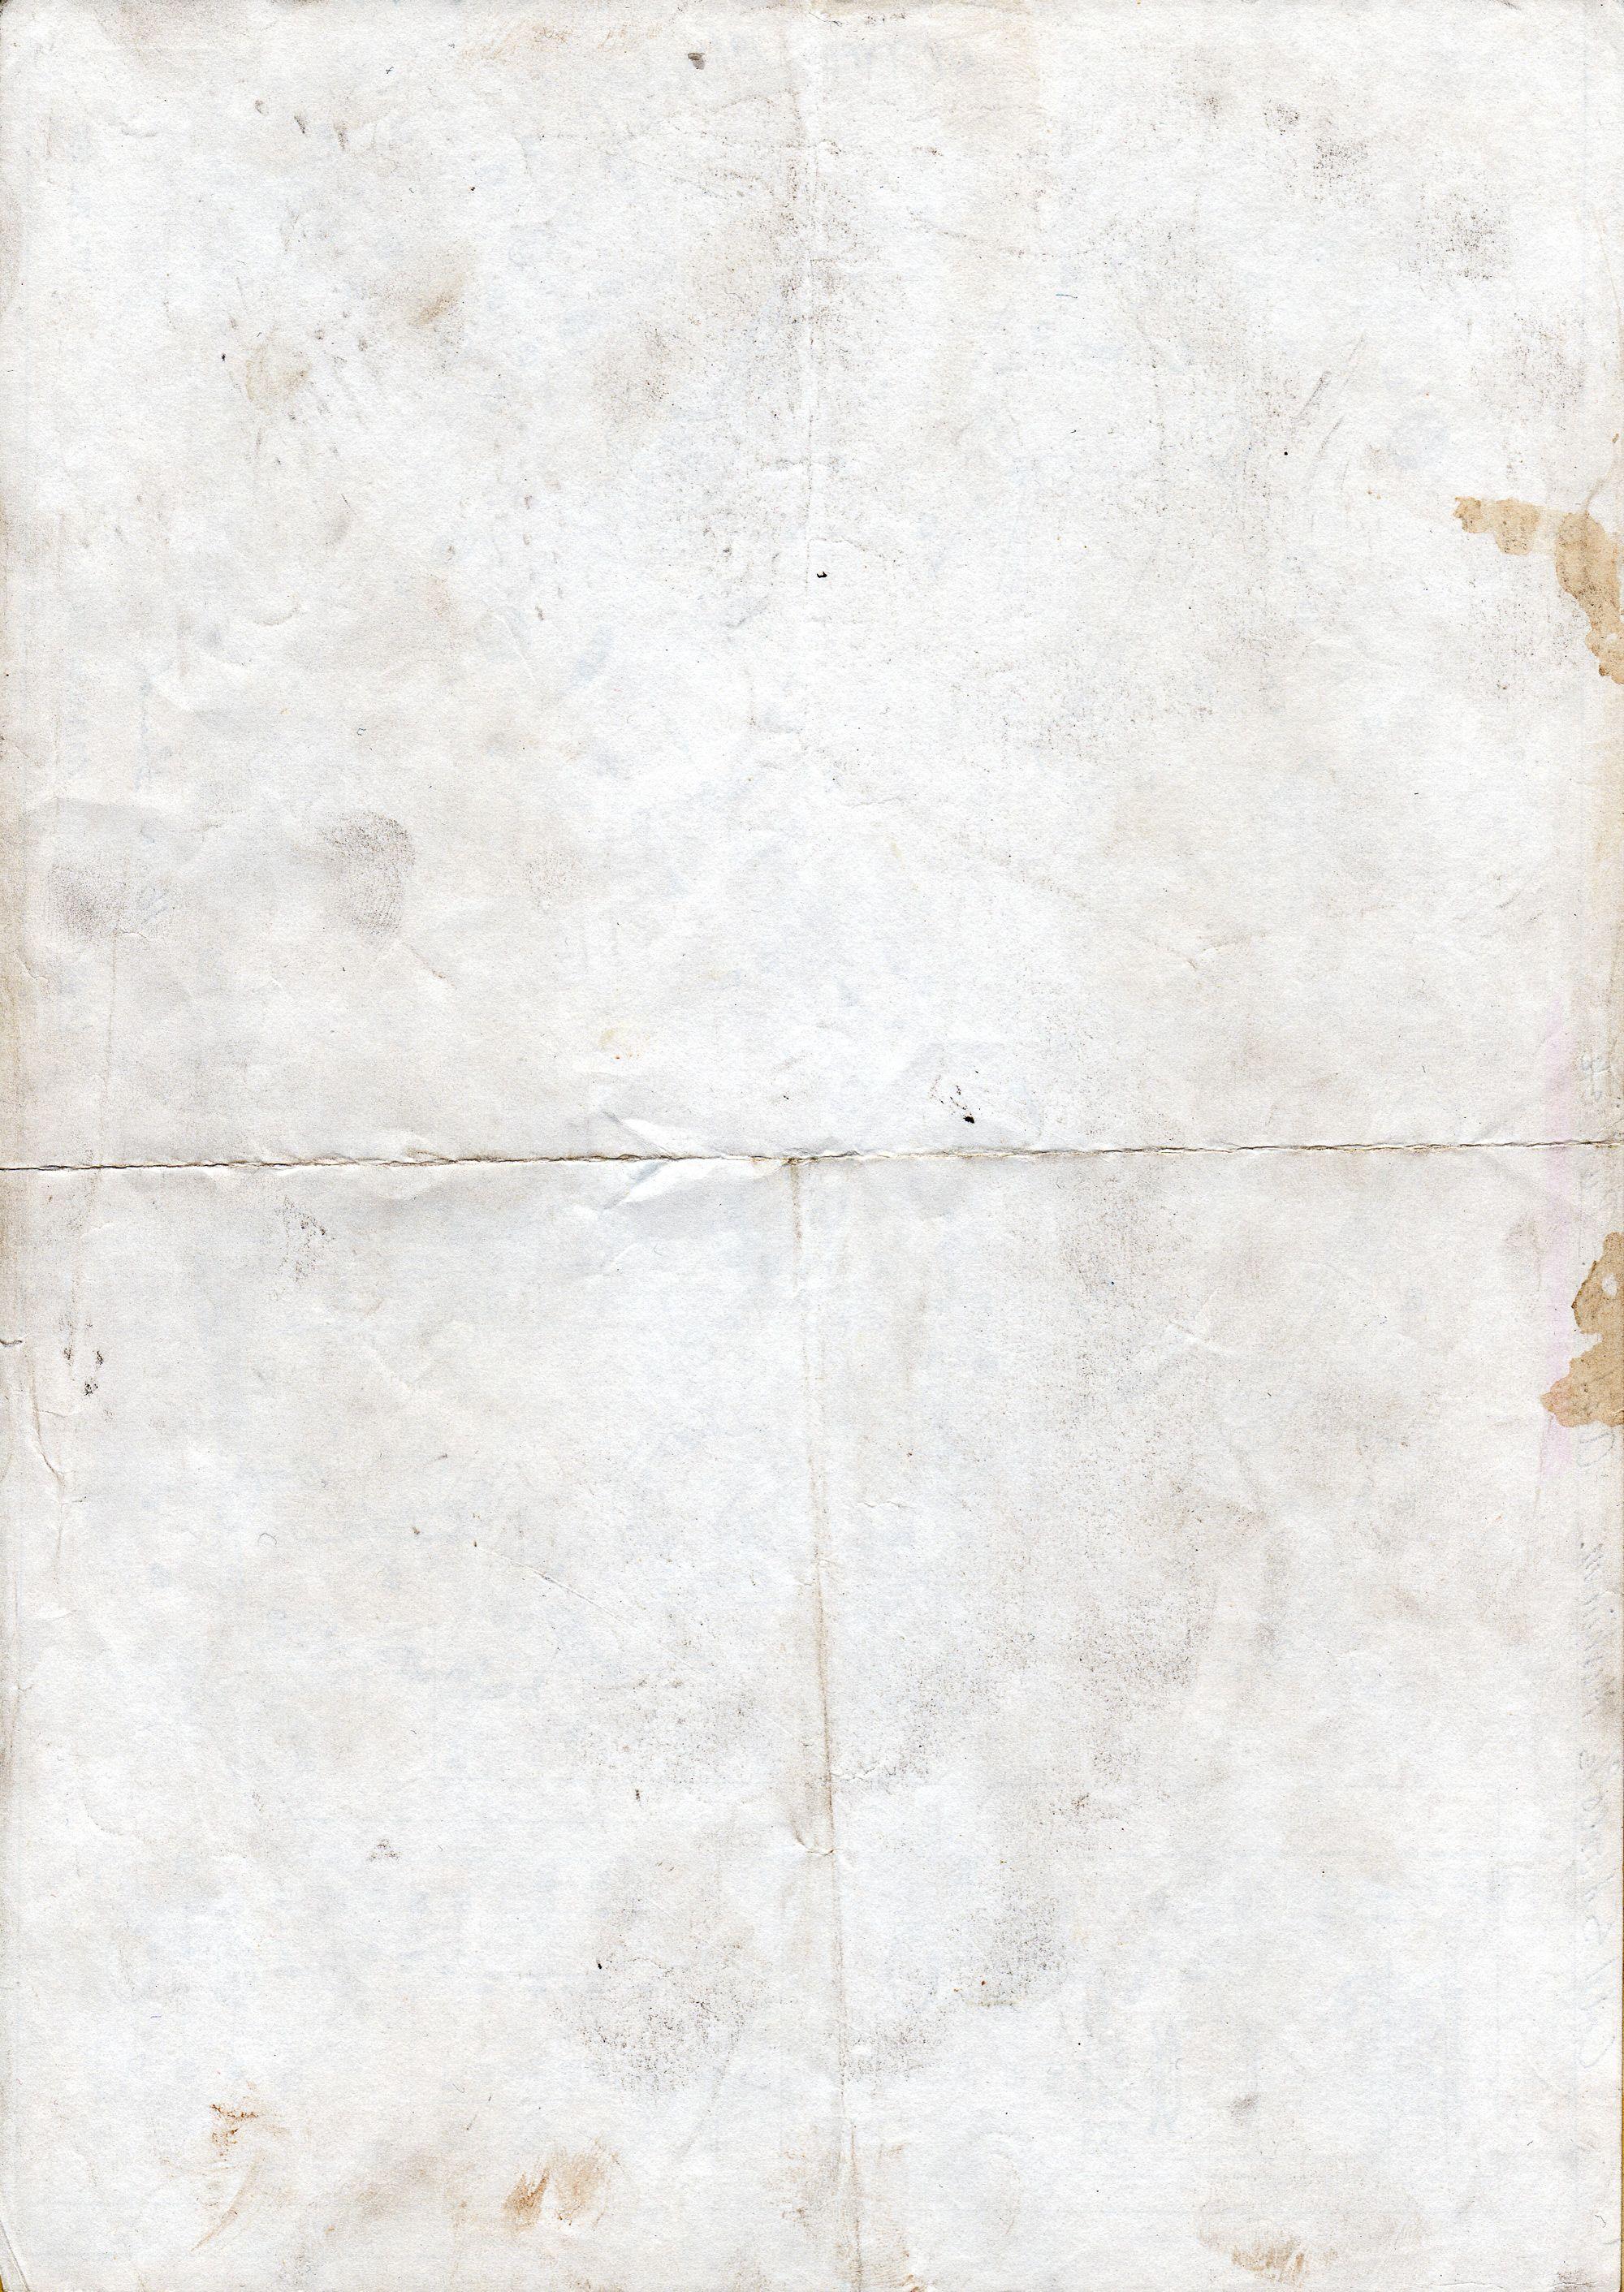 Grungy Paper Texture V 5 By Bashcorpo Deviantart Com On